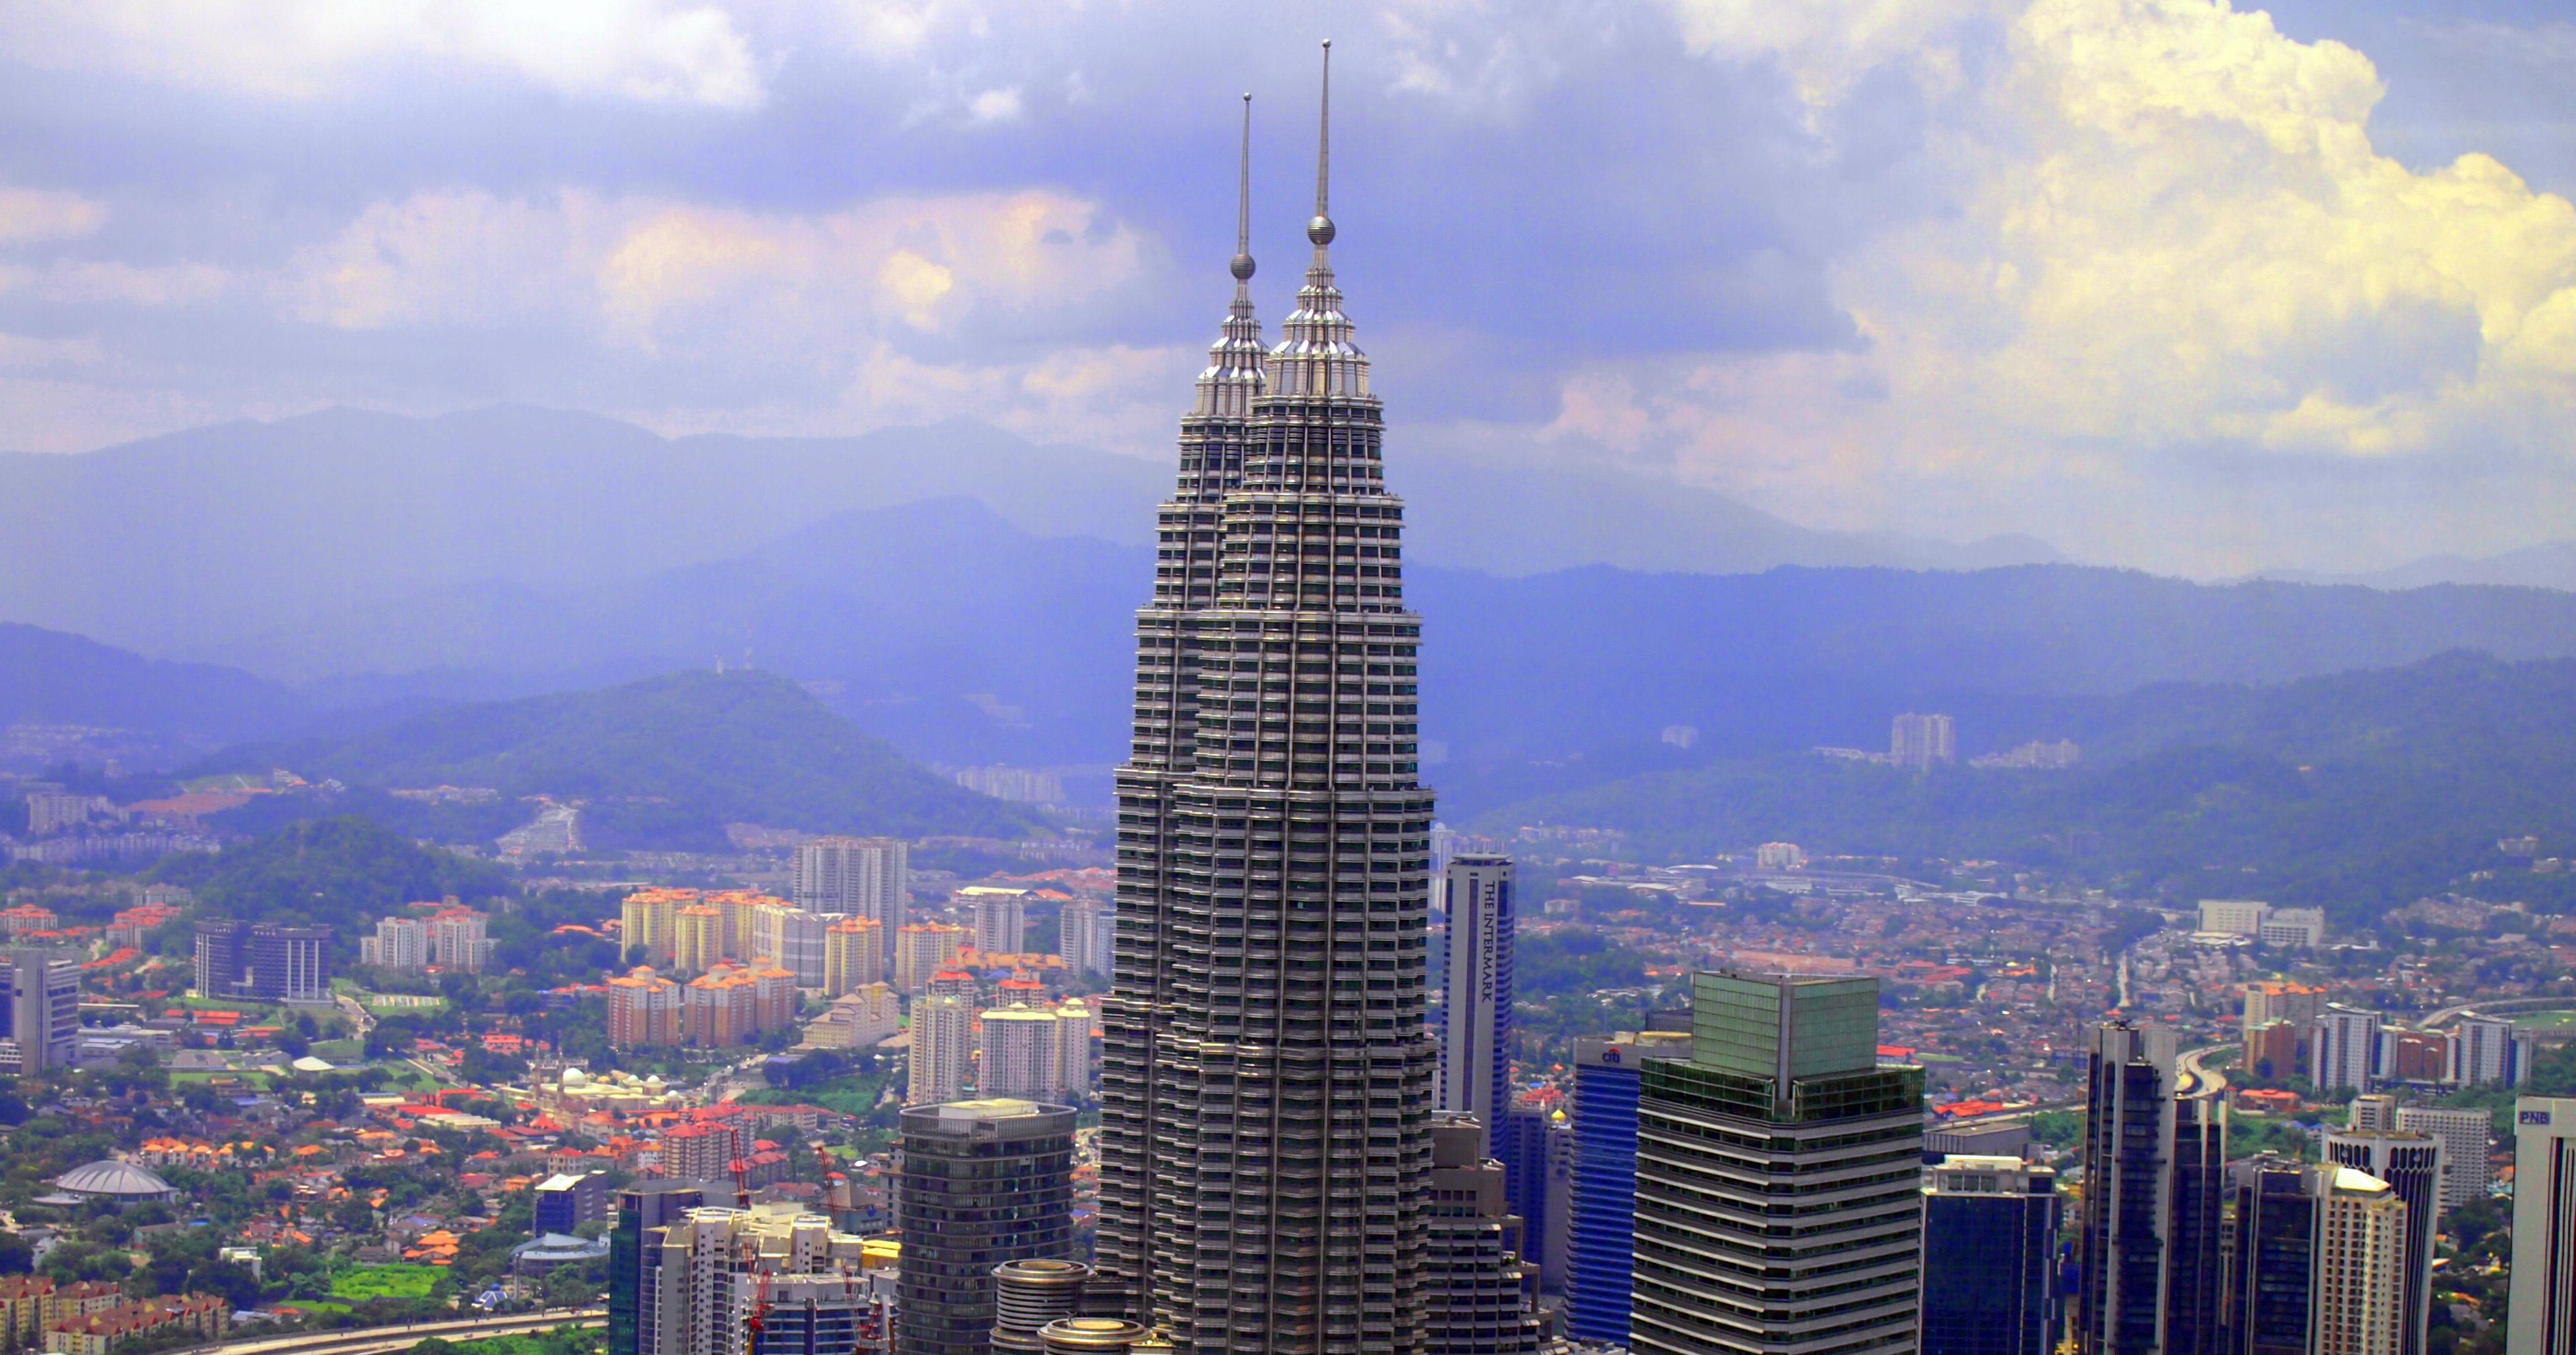 Malajsie-Kuala-Lumpur-vyhlídka